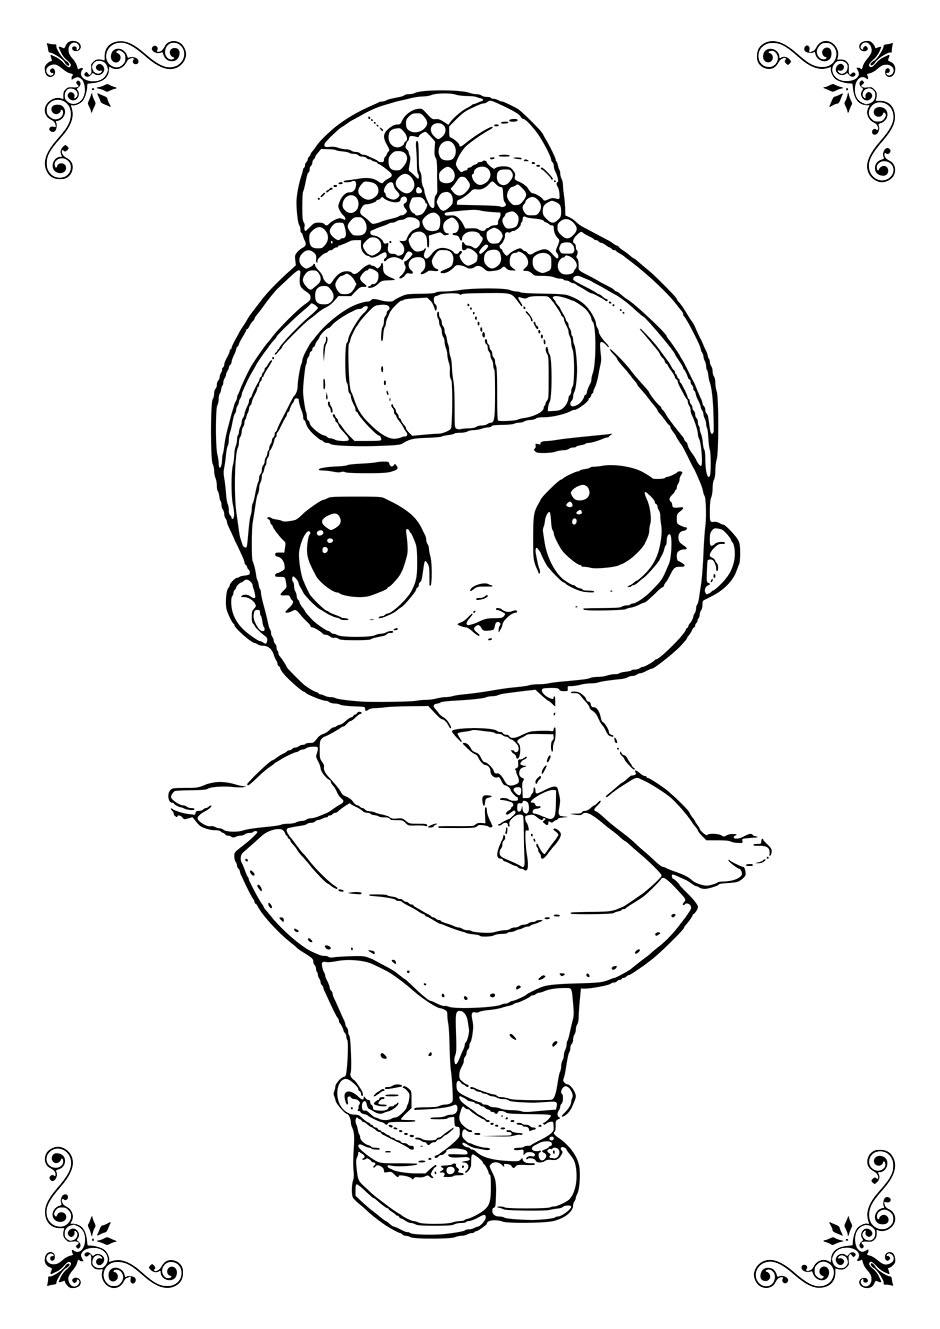 Раскраска: кукла ЛОЛ принцесса — raskraski-a4.ru